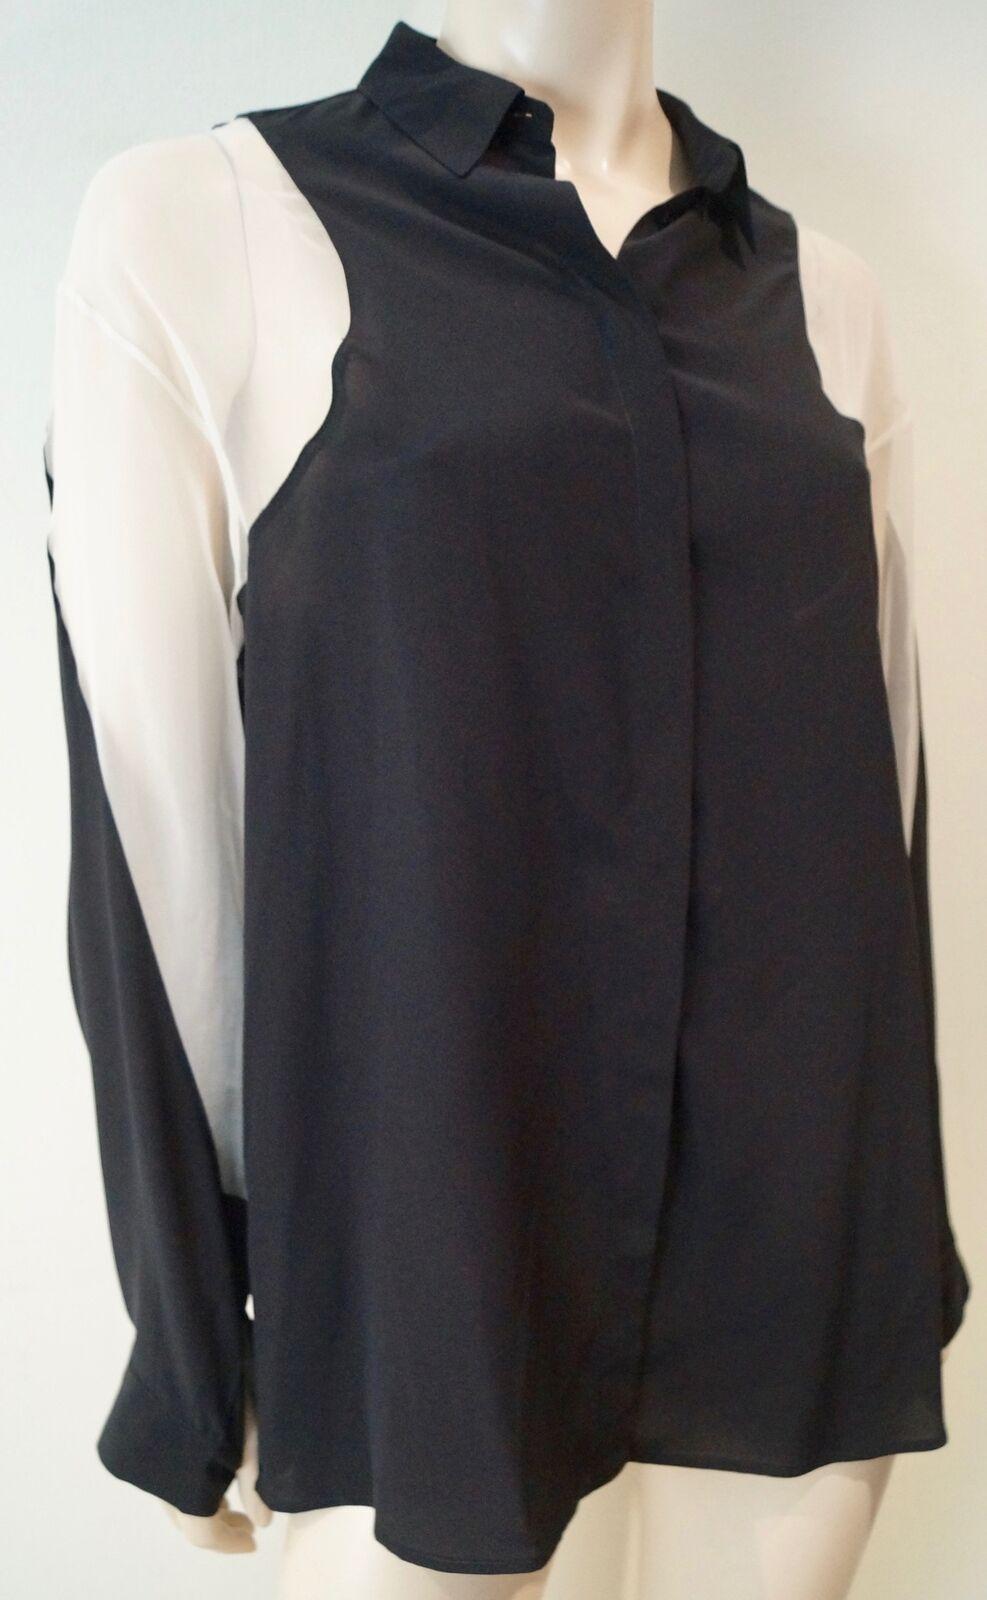 STELLA MCCARTNEY schwarz Silk Cream Sheer Panelled Collarot Blouse Top 42 UK12